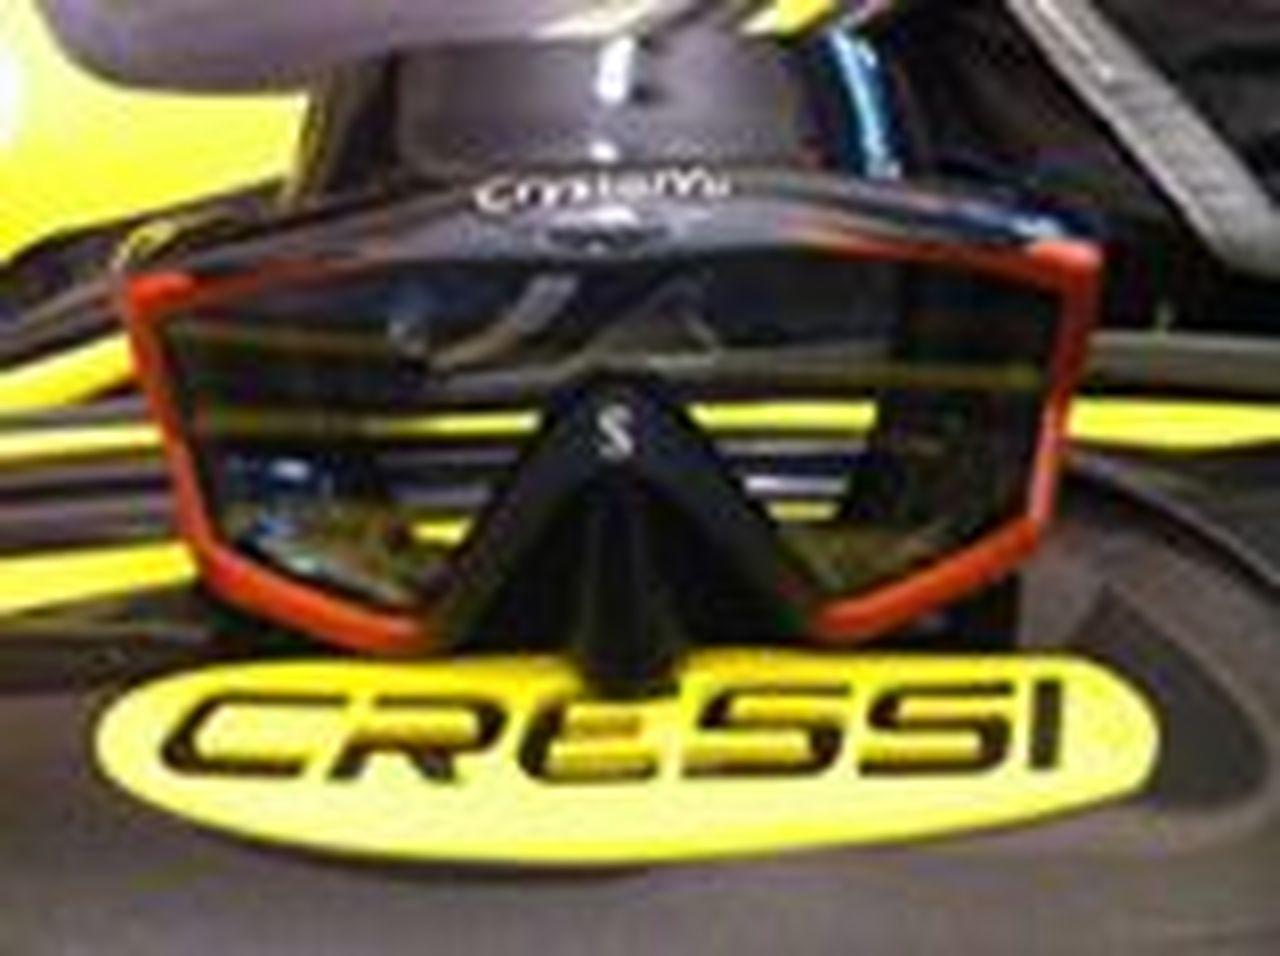 Black Close-up Cressi Diving Hobbies Oragne Scuba Diving Scubapro